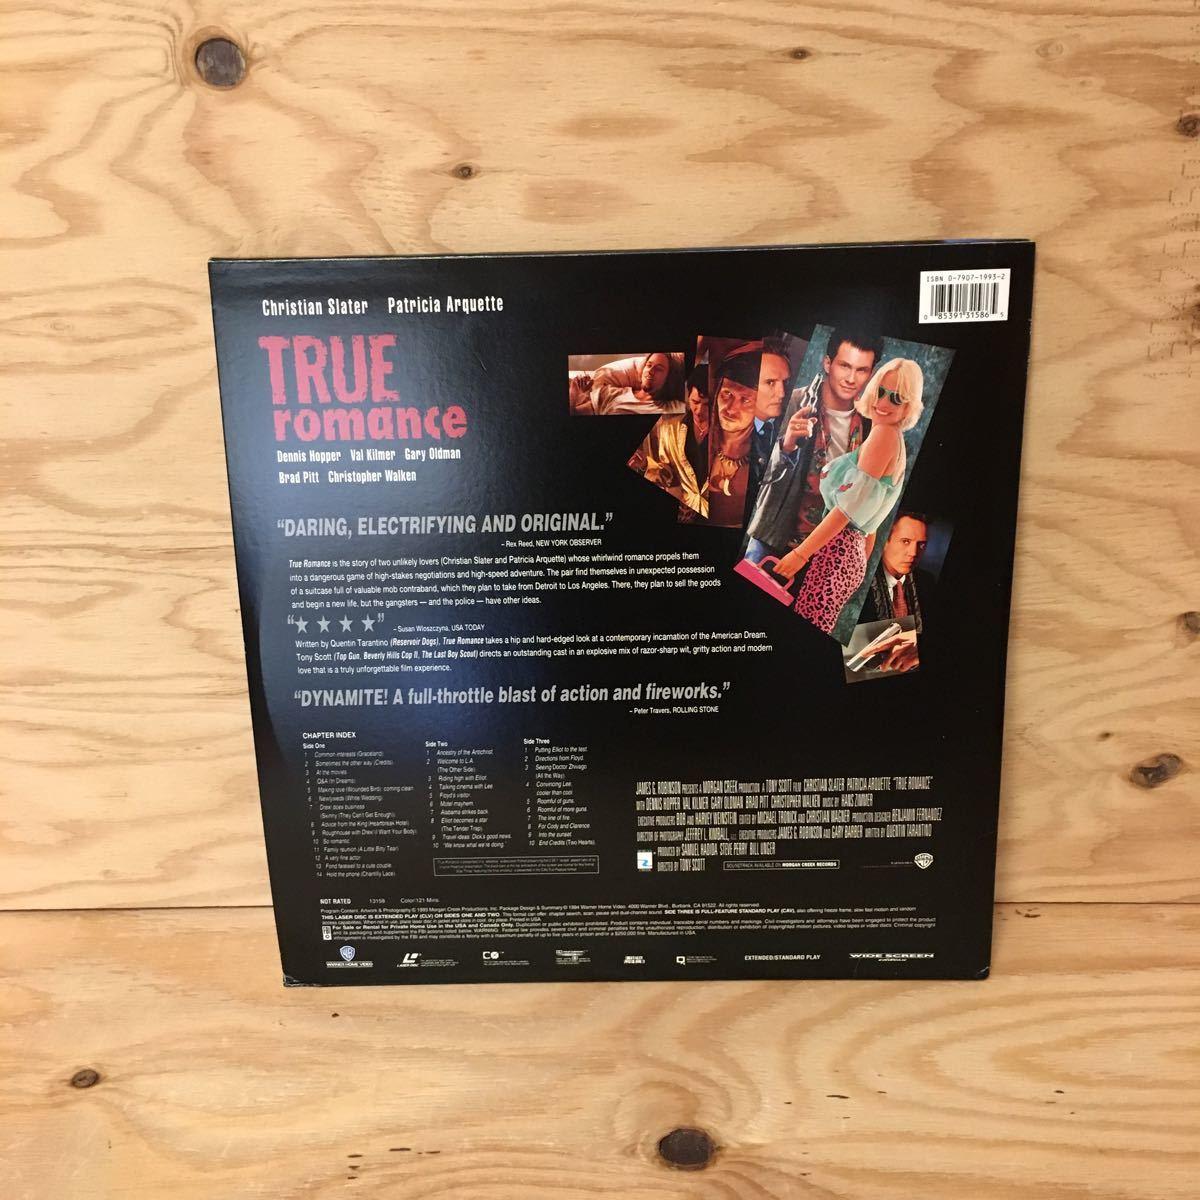 ◎Y3FIID-200305 レア[TRUE ROMANCE 輸入盤]LD レーザーディスク CHRISTIAN SLATER TONY SCOTT_画像2